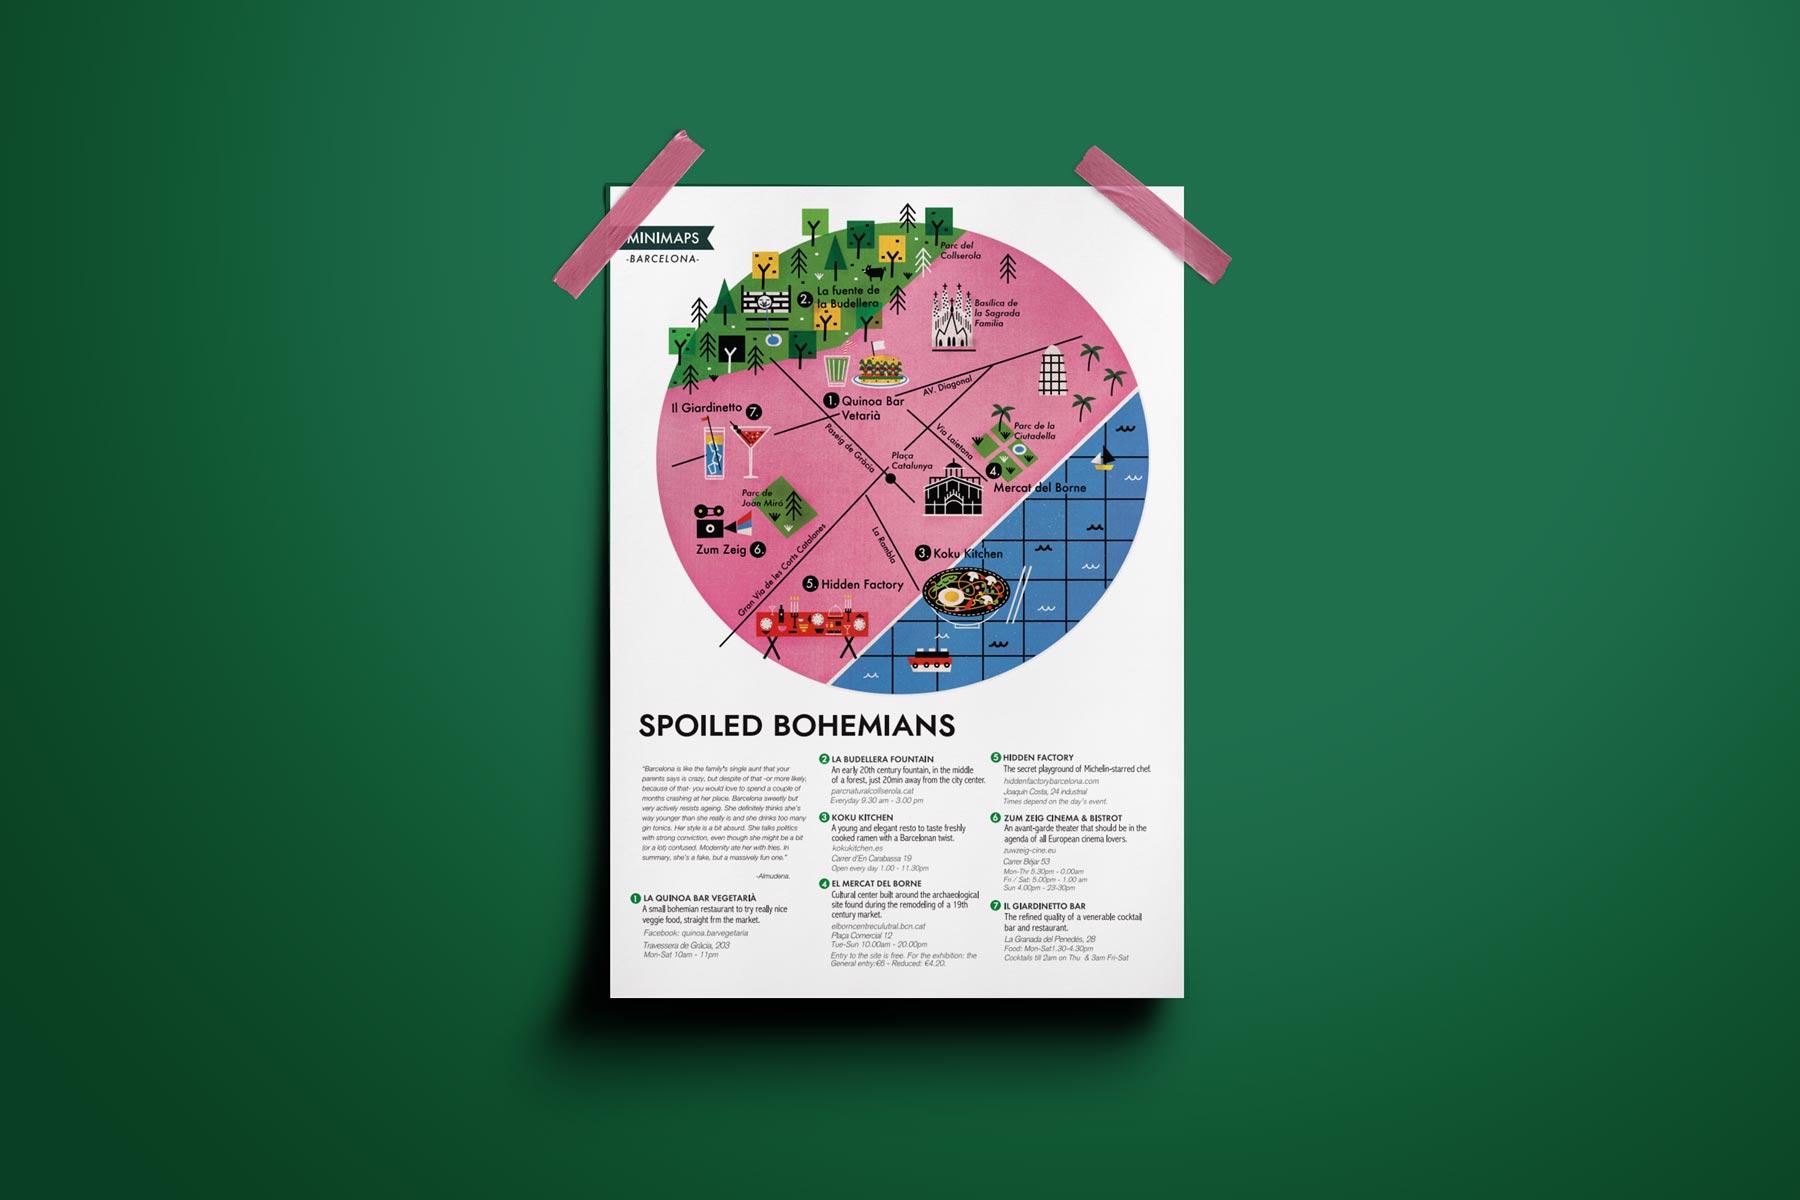 Minimap-BCNA-Spoiled-Bohemians